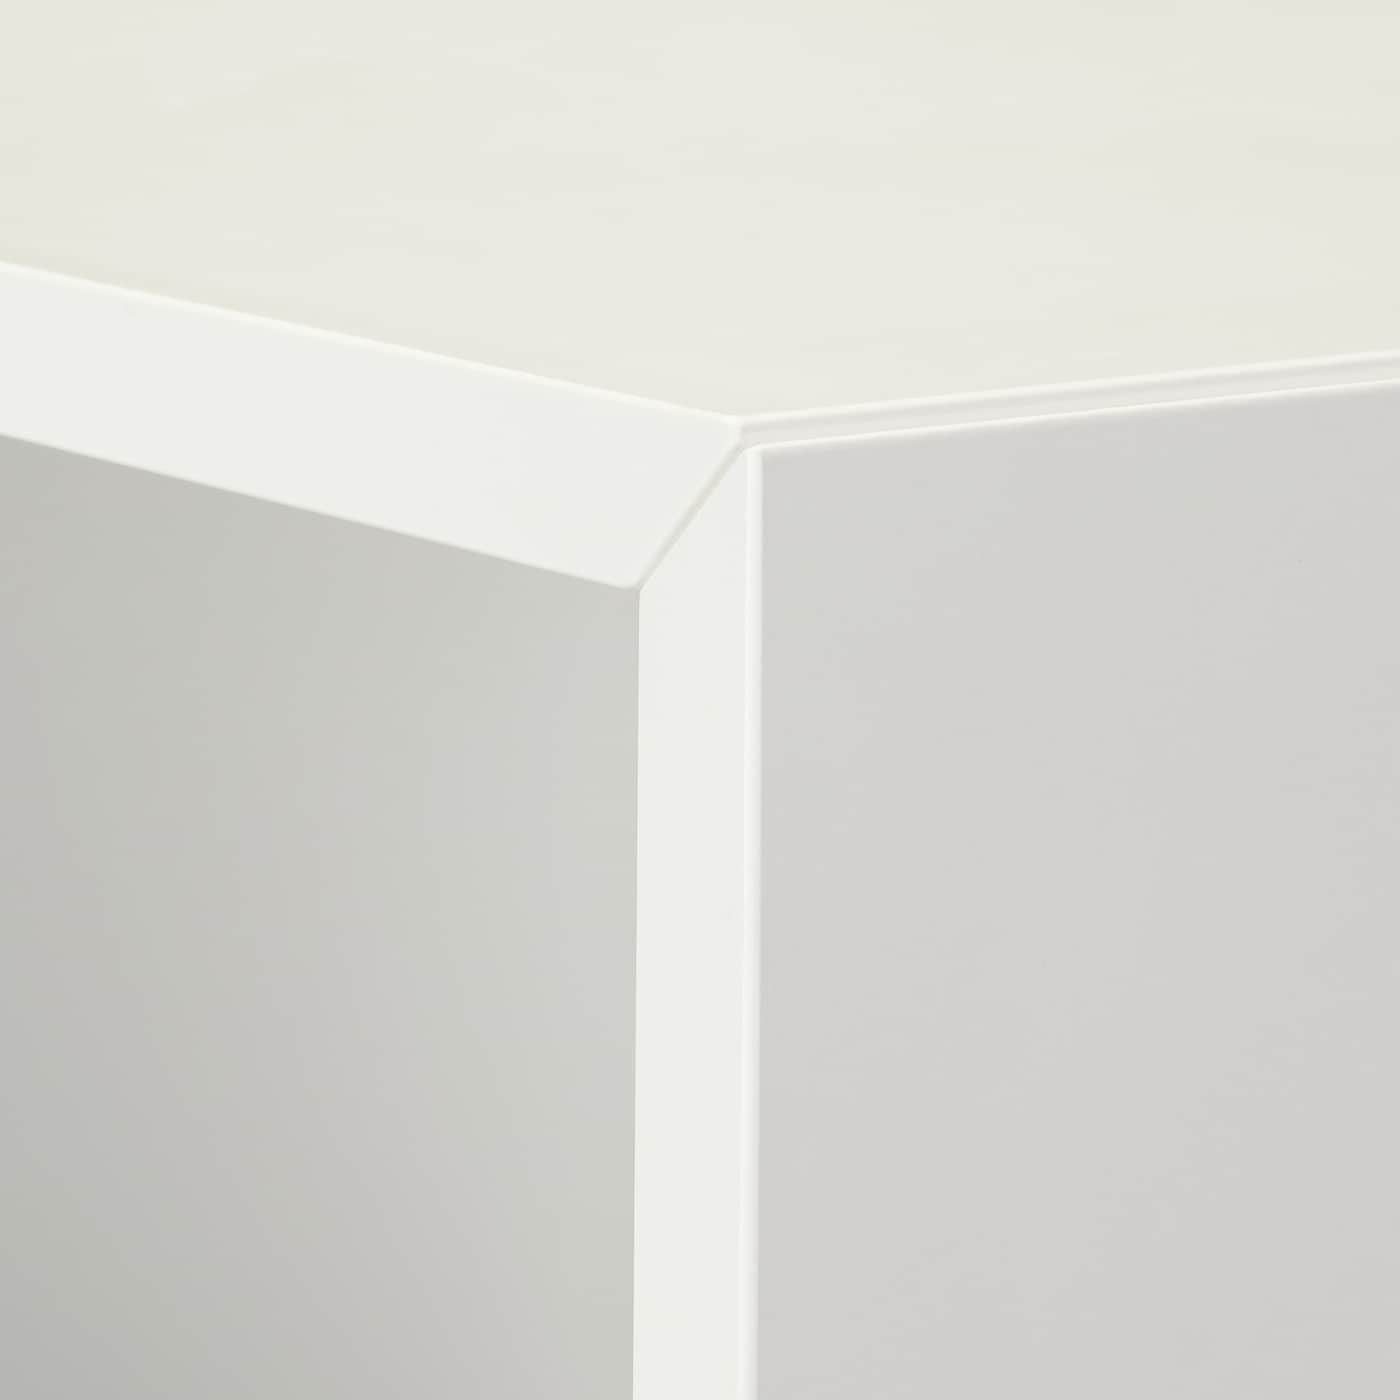 EKET element bijela 35 cm 35 cm 35 cm 7 kg